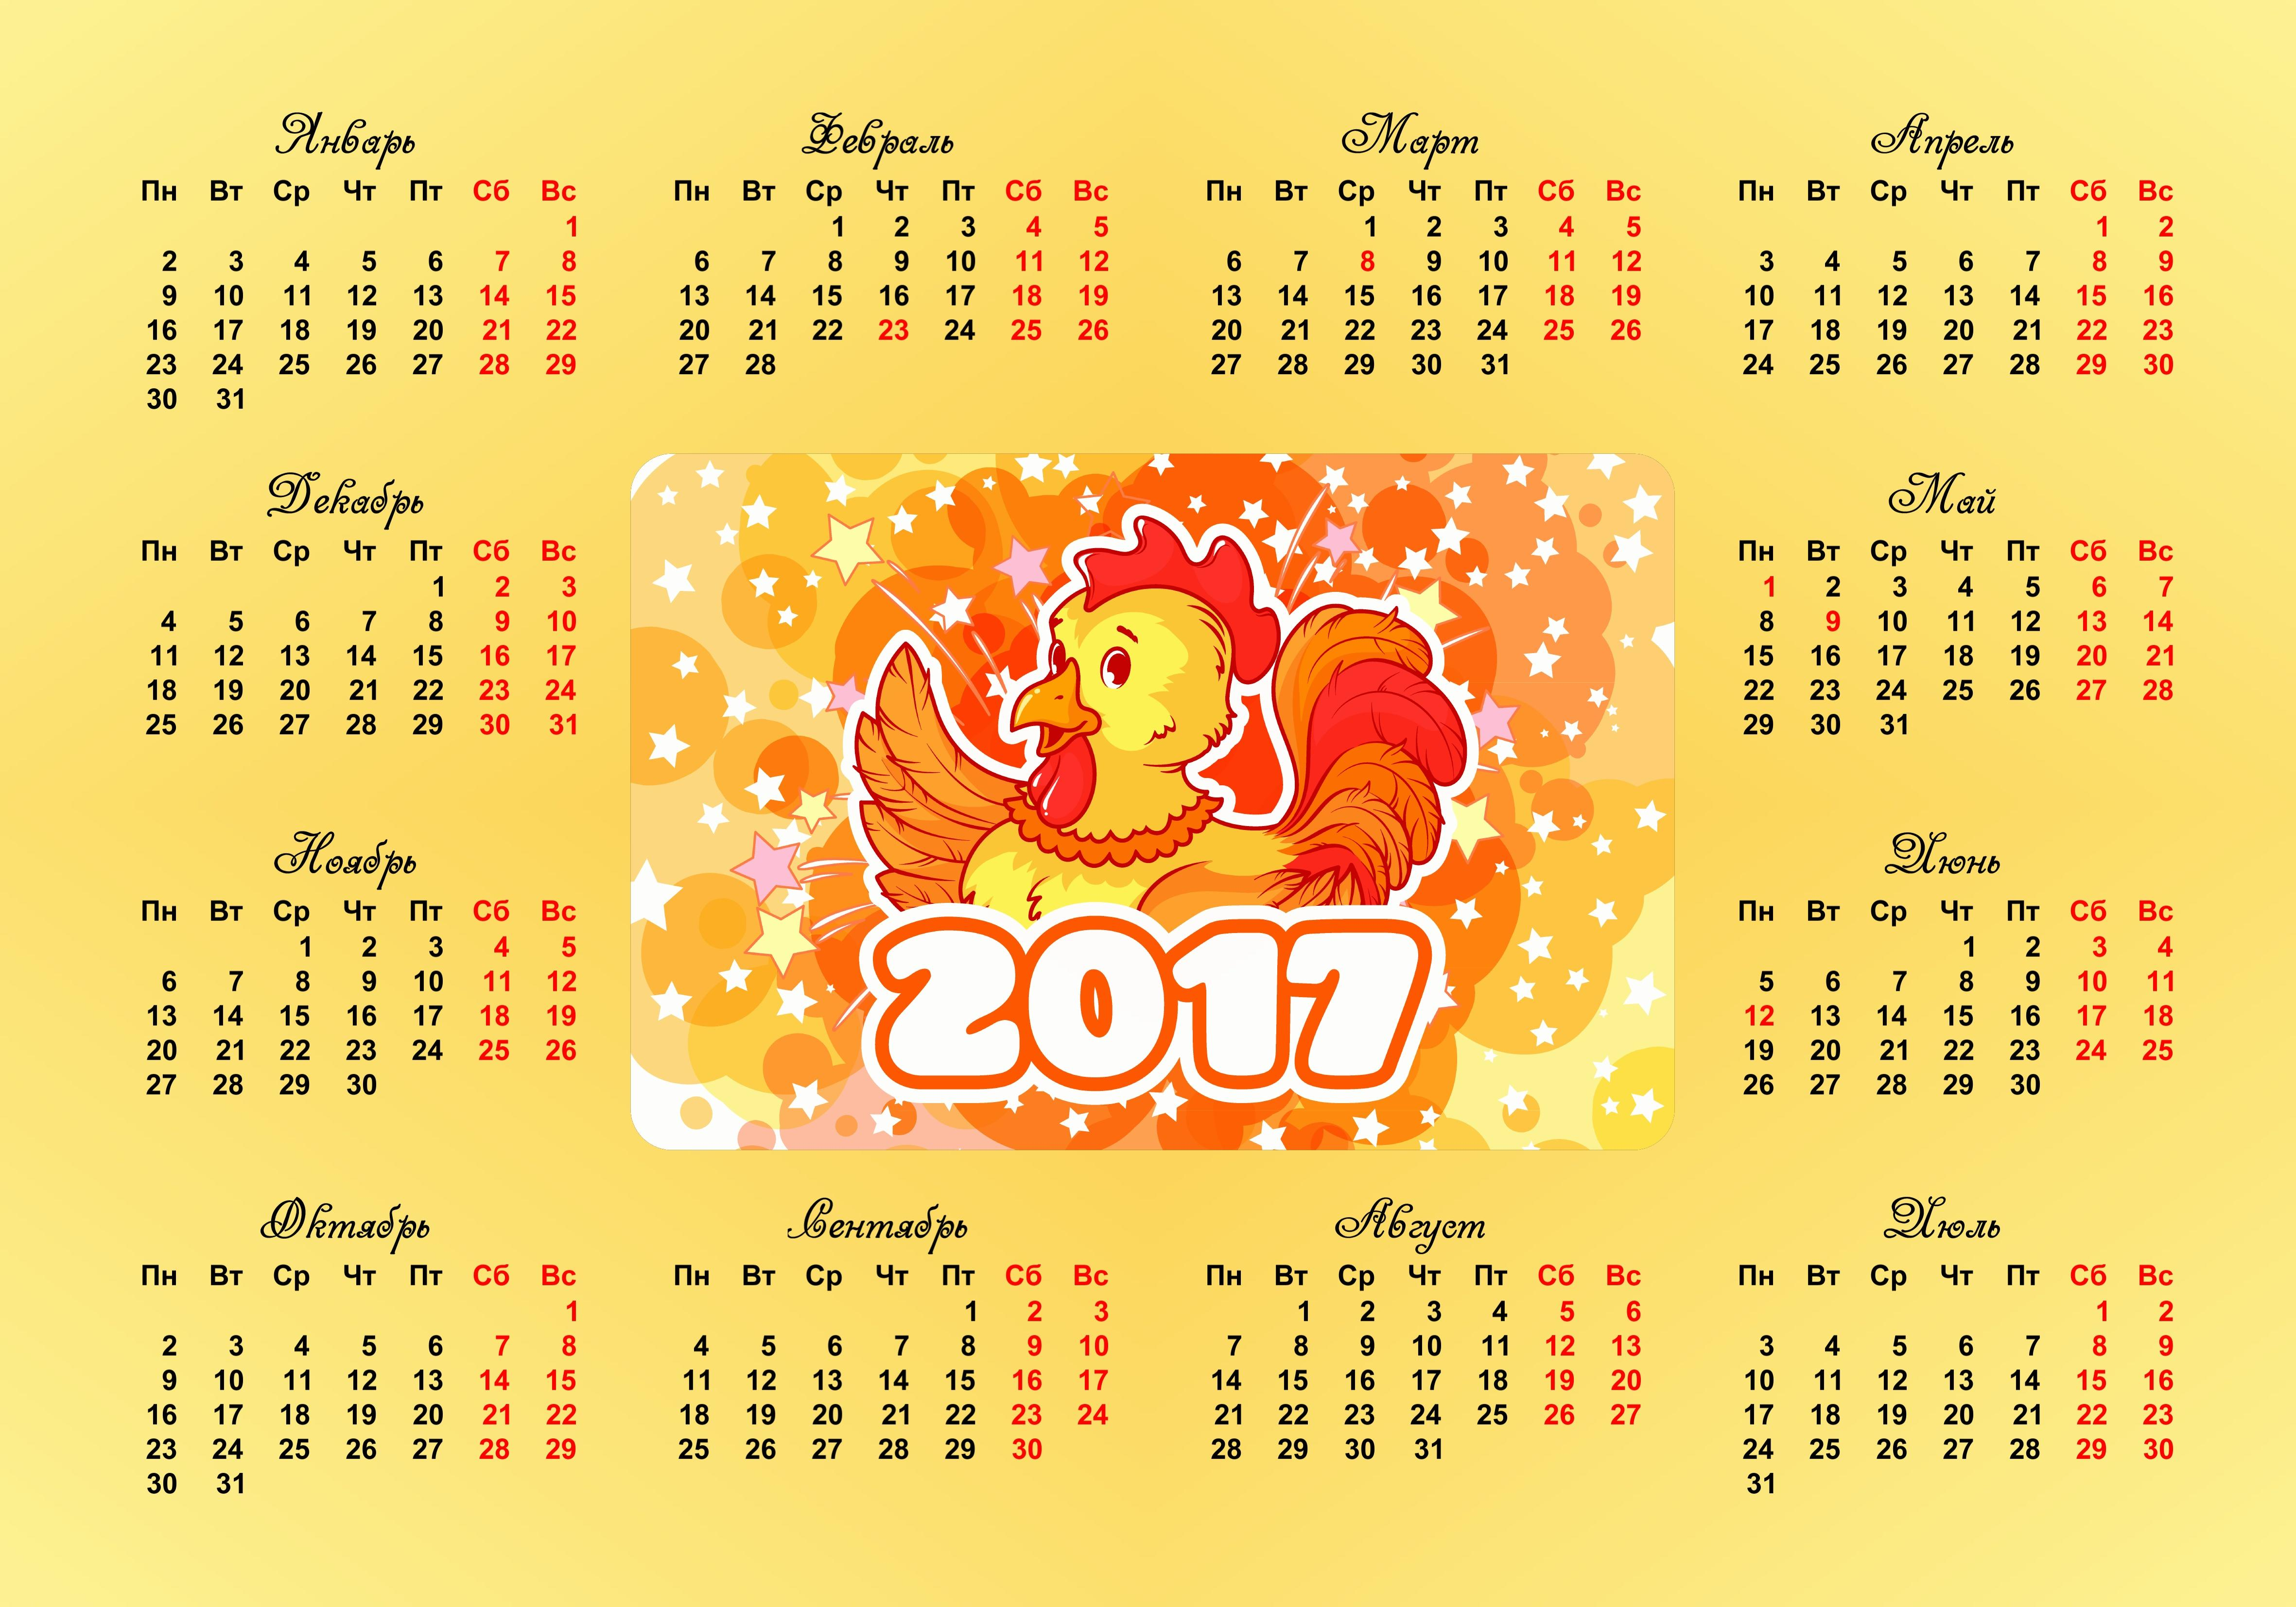 календарь на 2017 год, год петуха, календарь год петуха